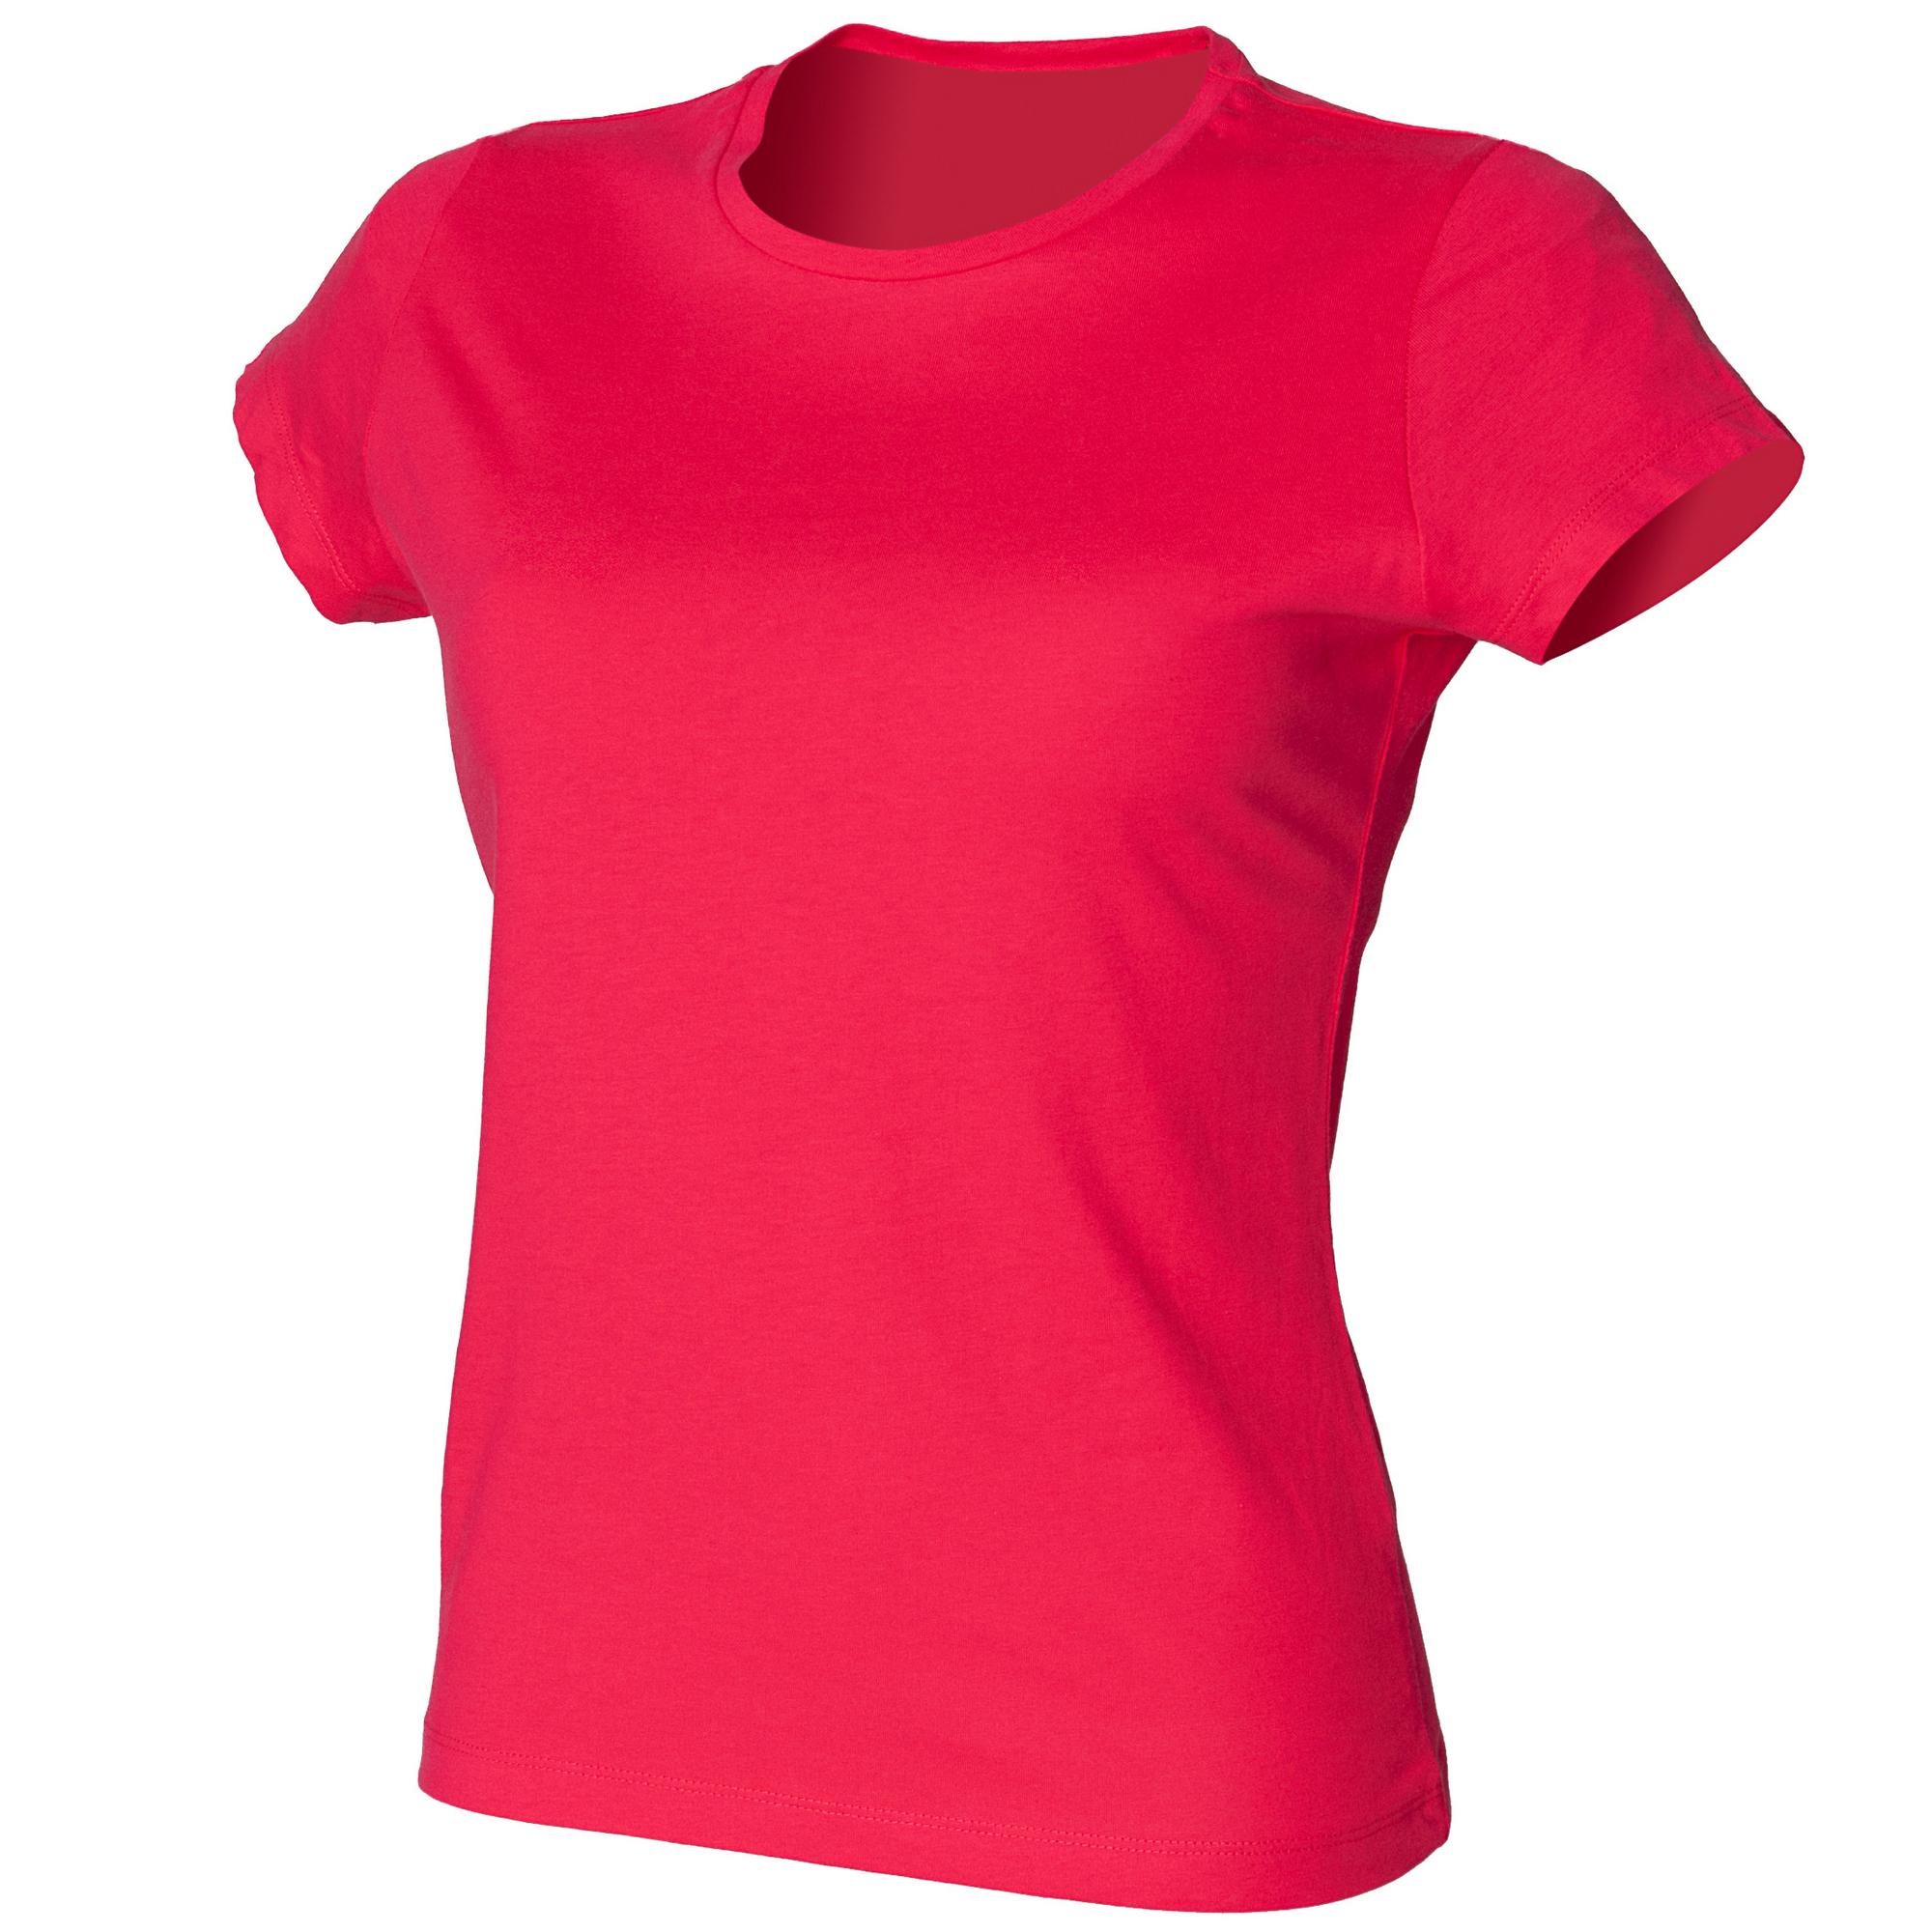 Skinni-Fit-Camiseta-Favourite-de-manga-corta-larga-para-chica-mujer